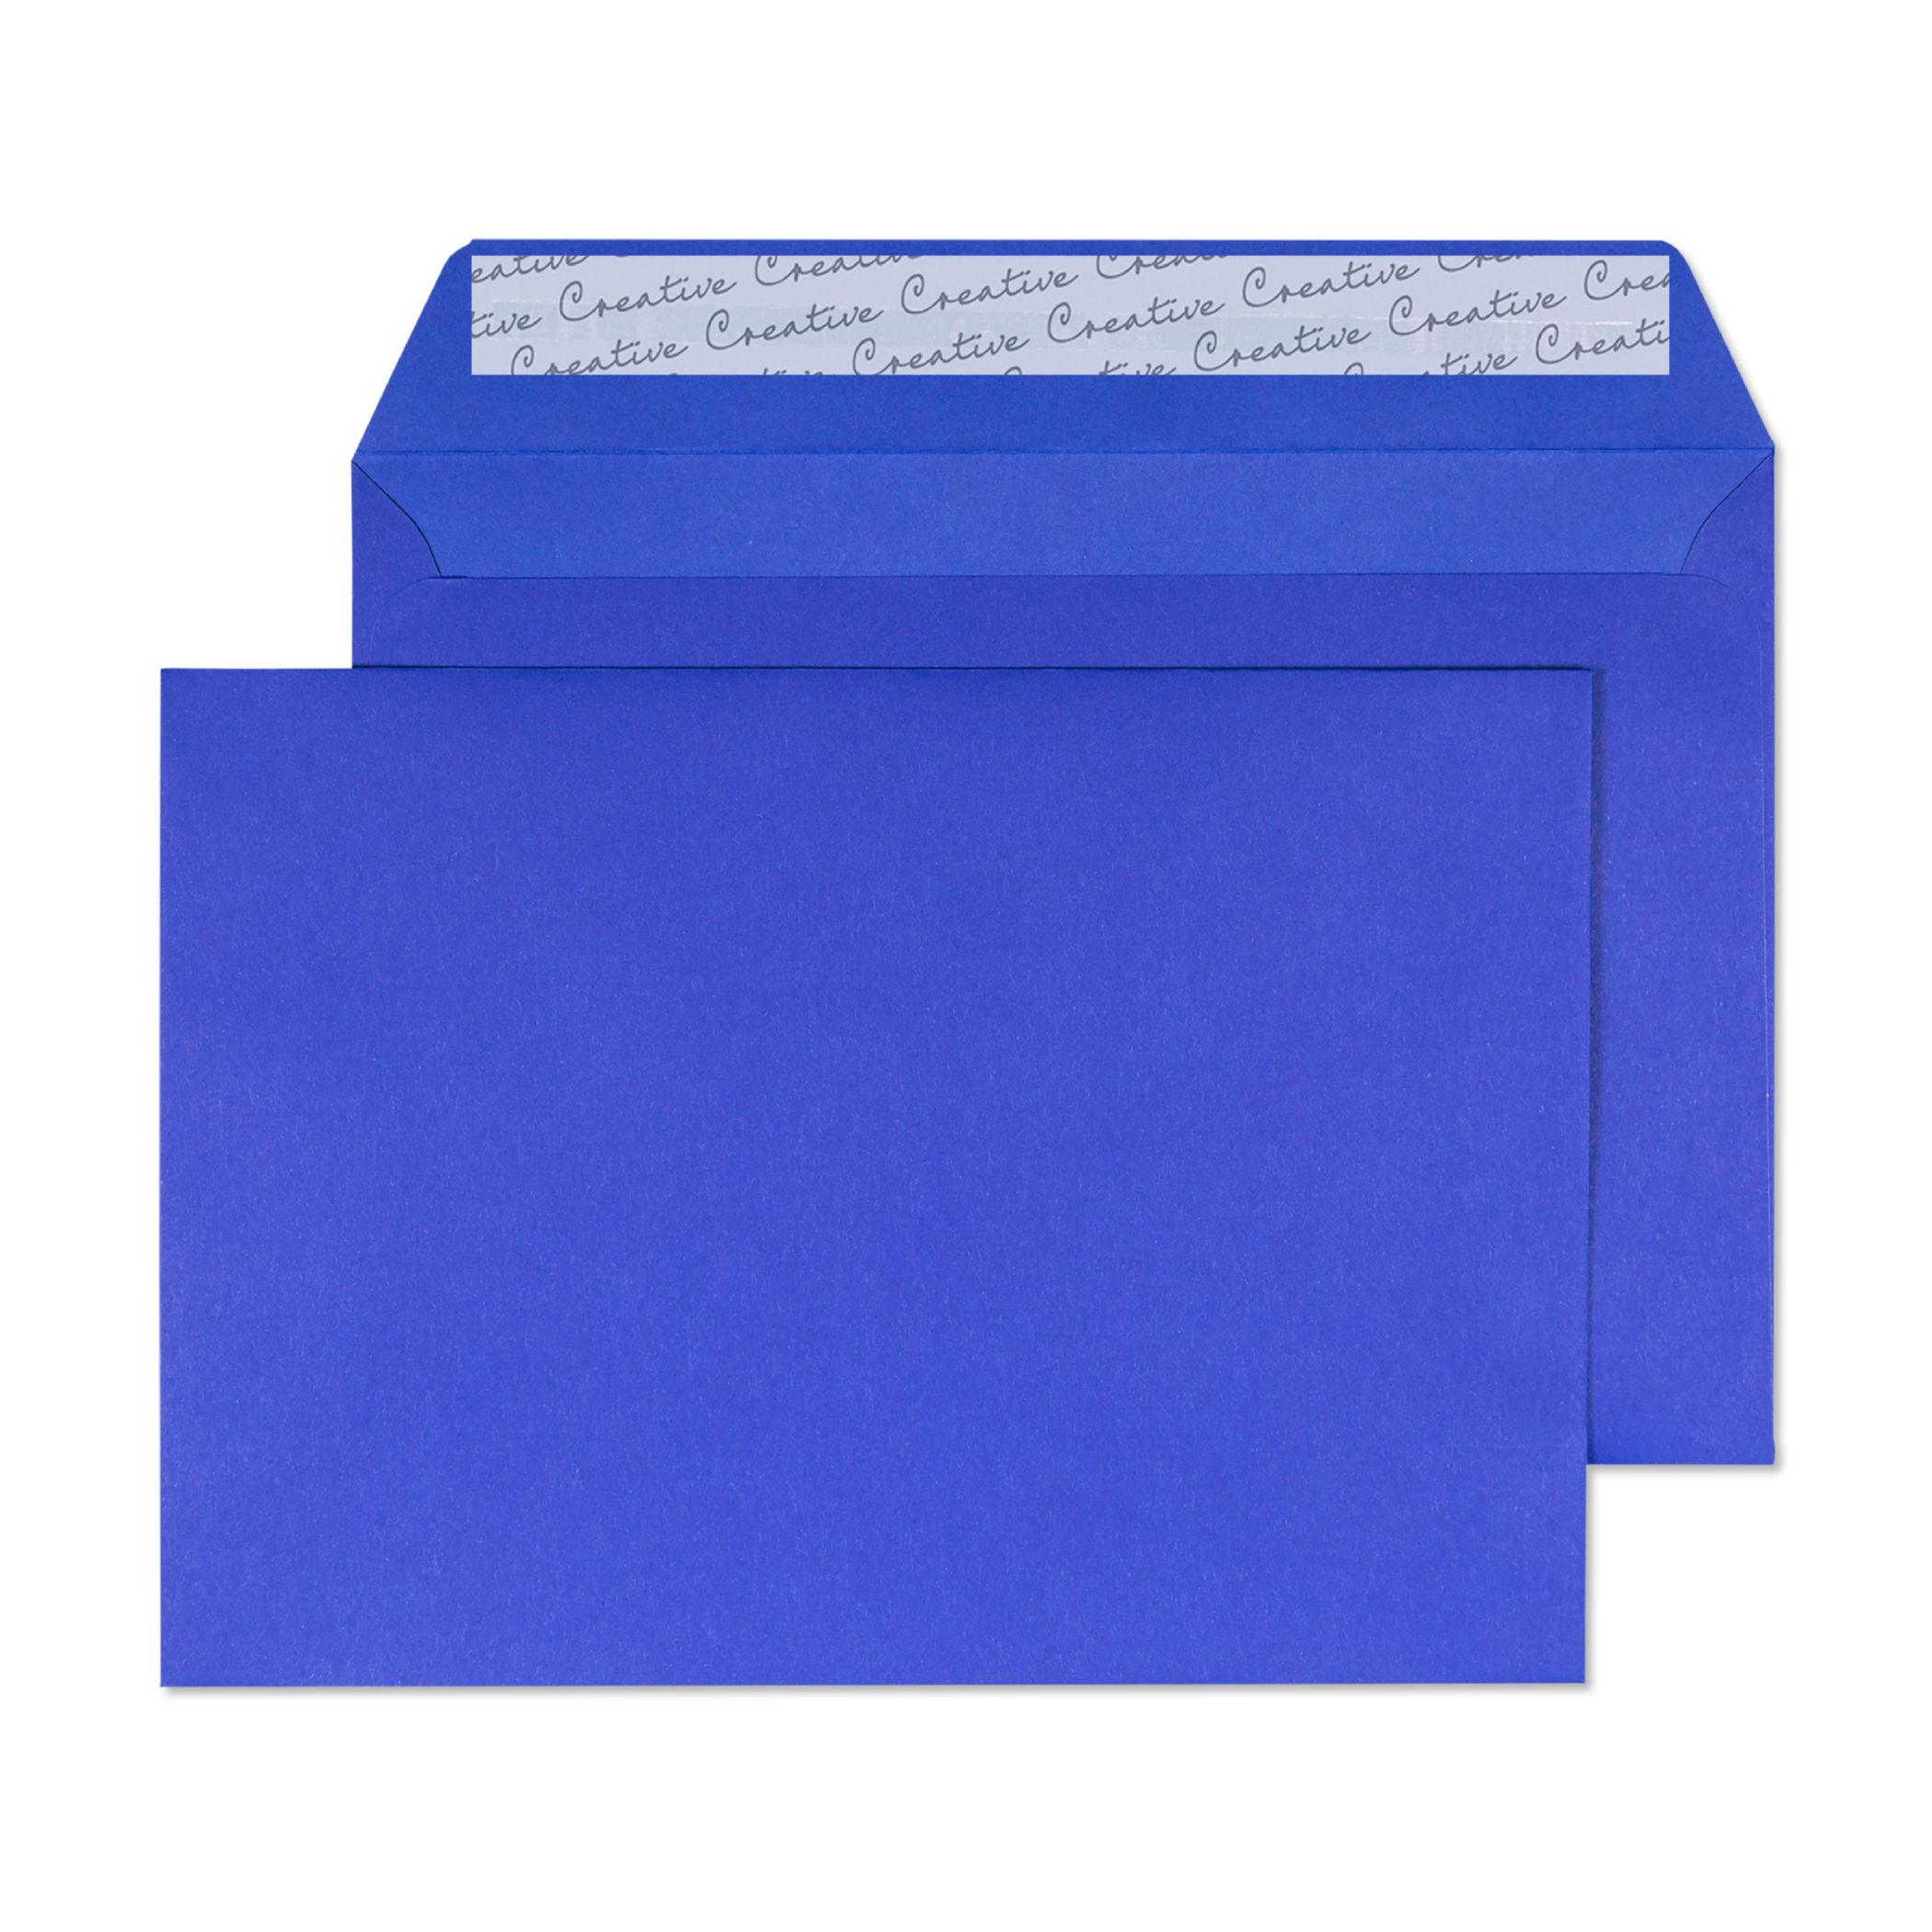 Blake Creative Colour Victory Blue Peel & Seal Wallet 162x229mm 120gsm Pack 25 Code 45343